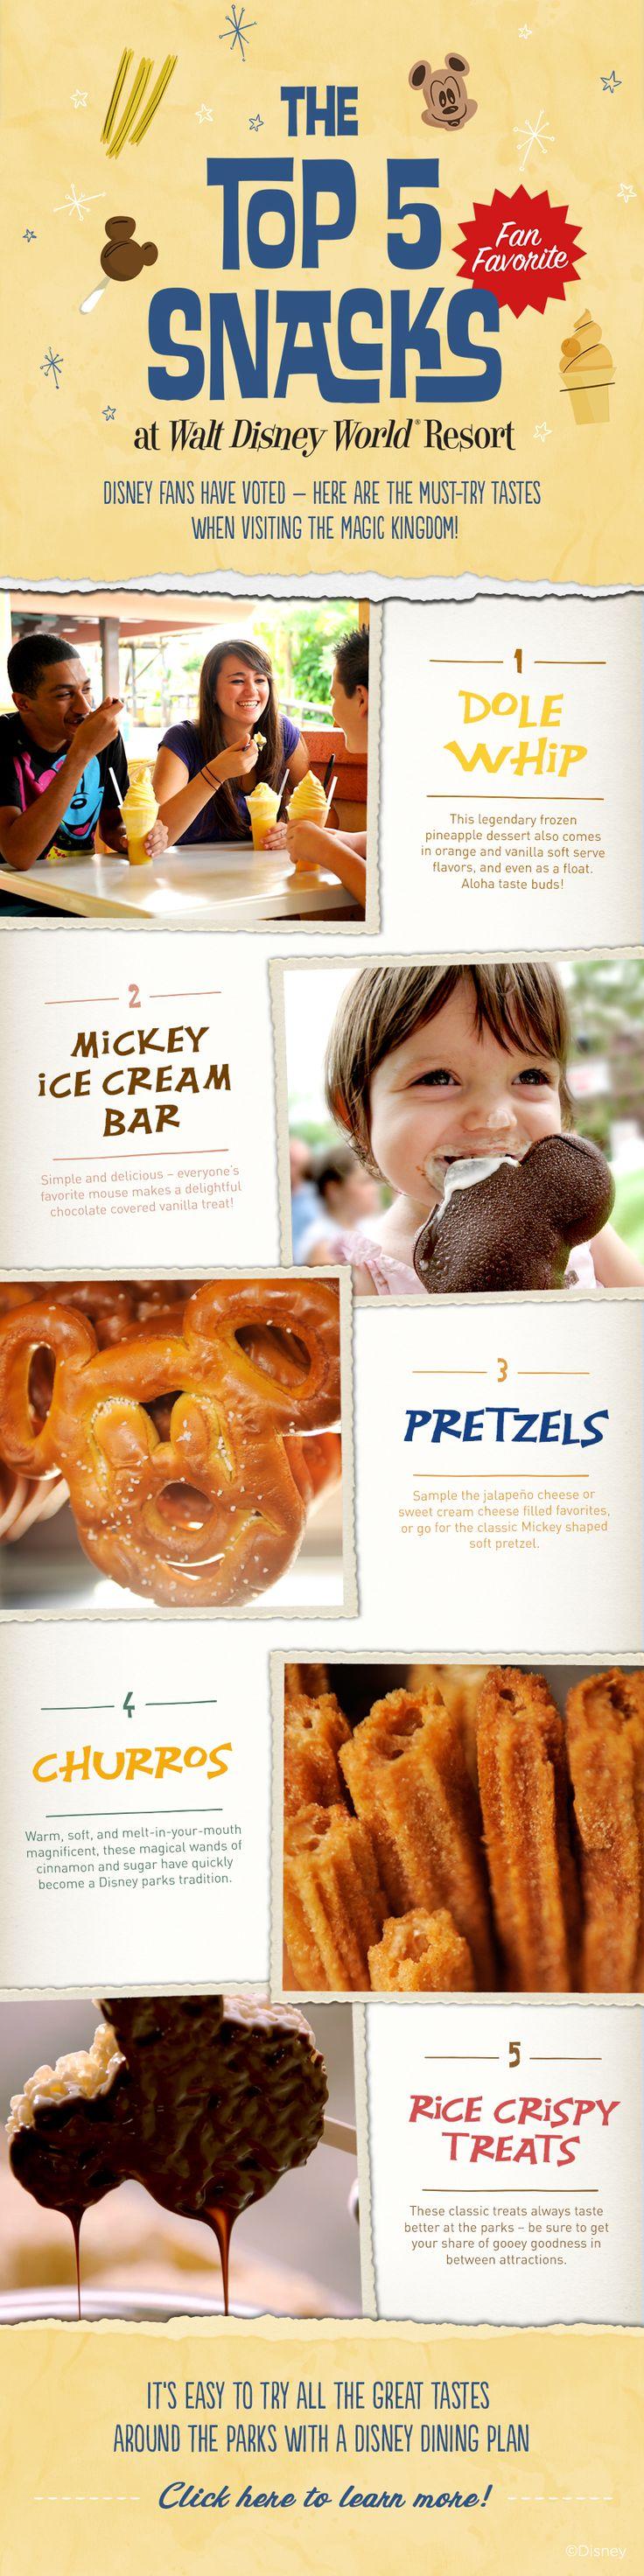 Top 5 snacks at #WaltDisneyWorld as voted by Disney fans!